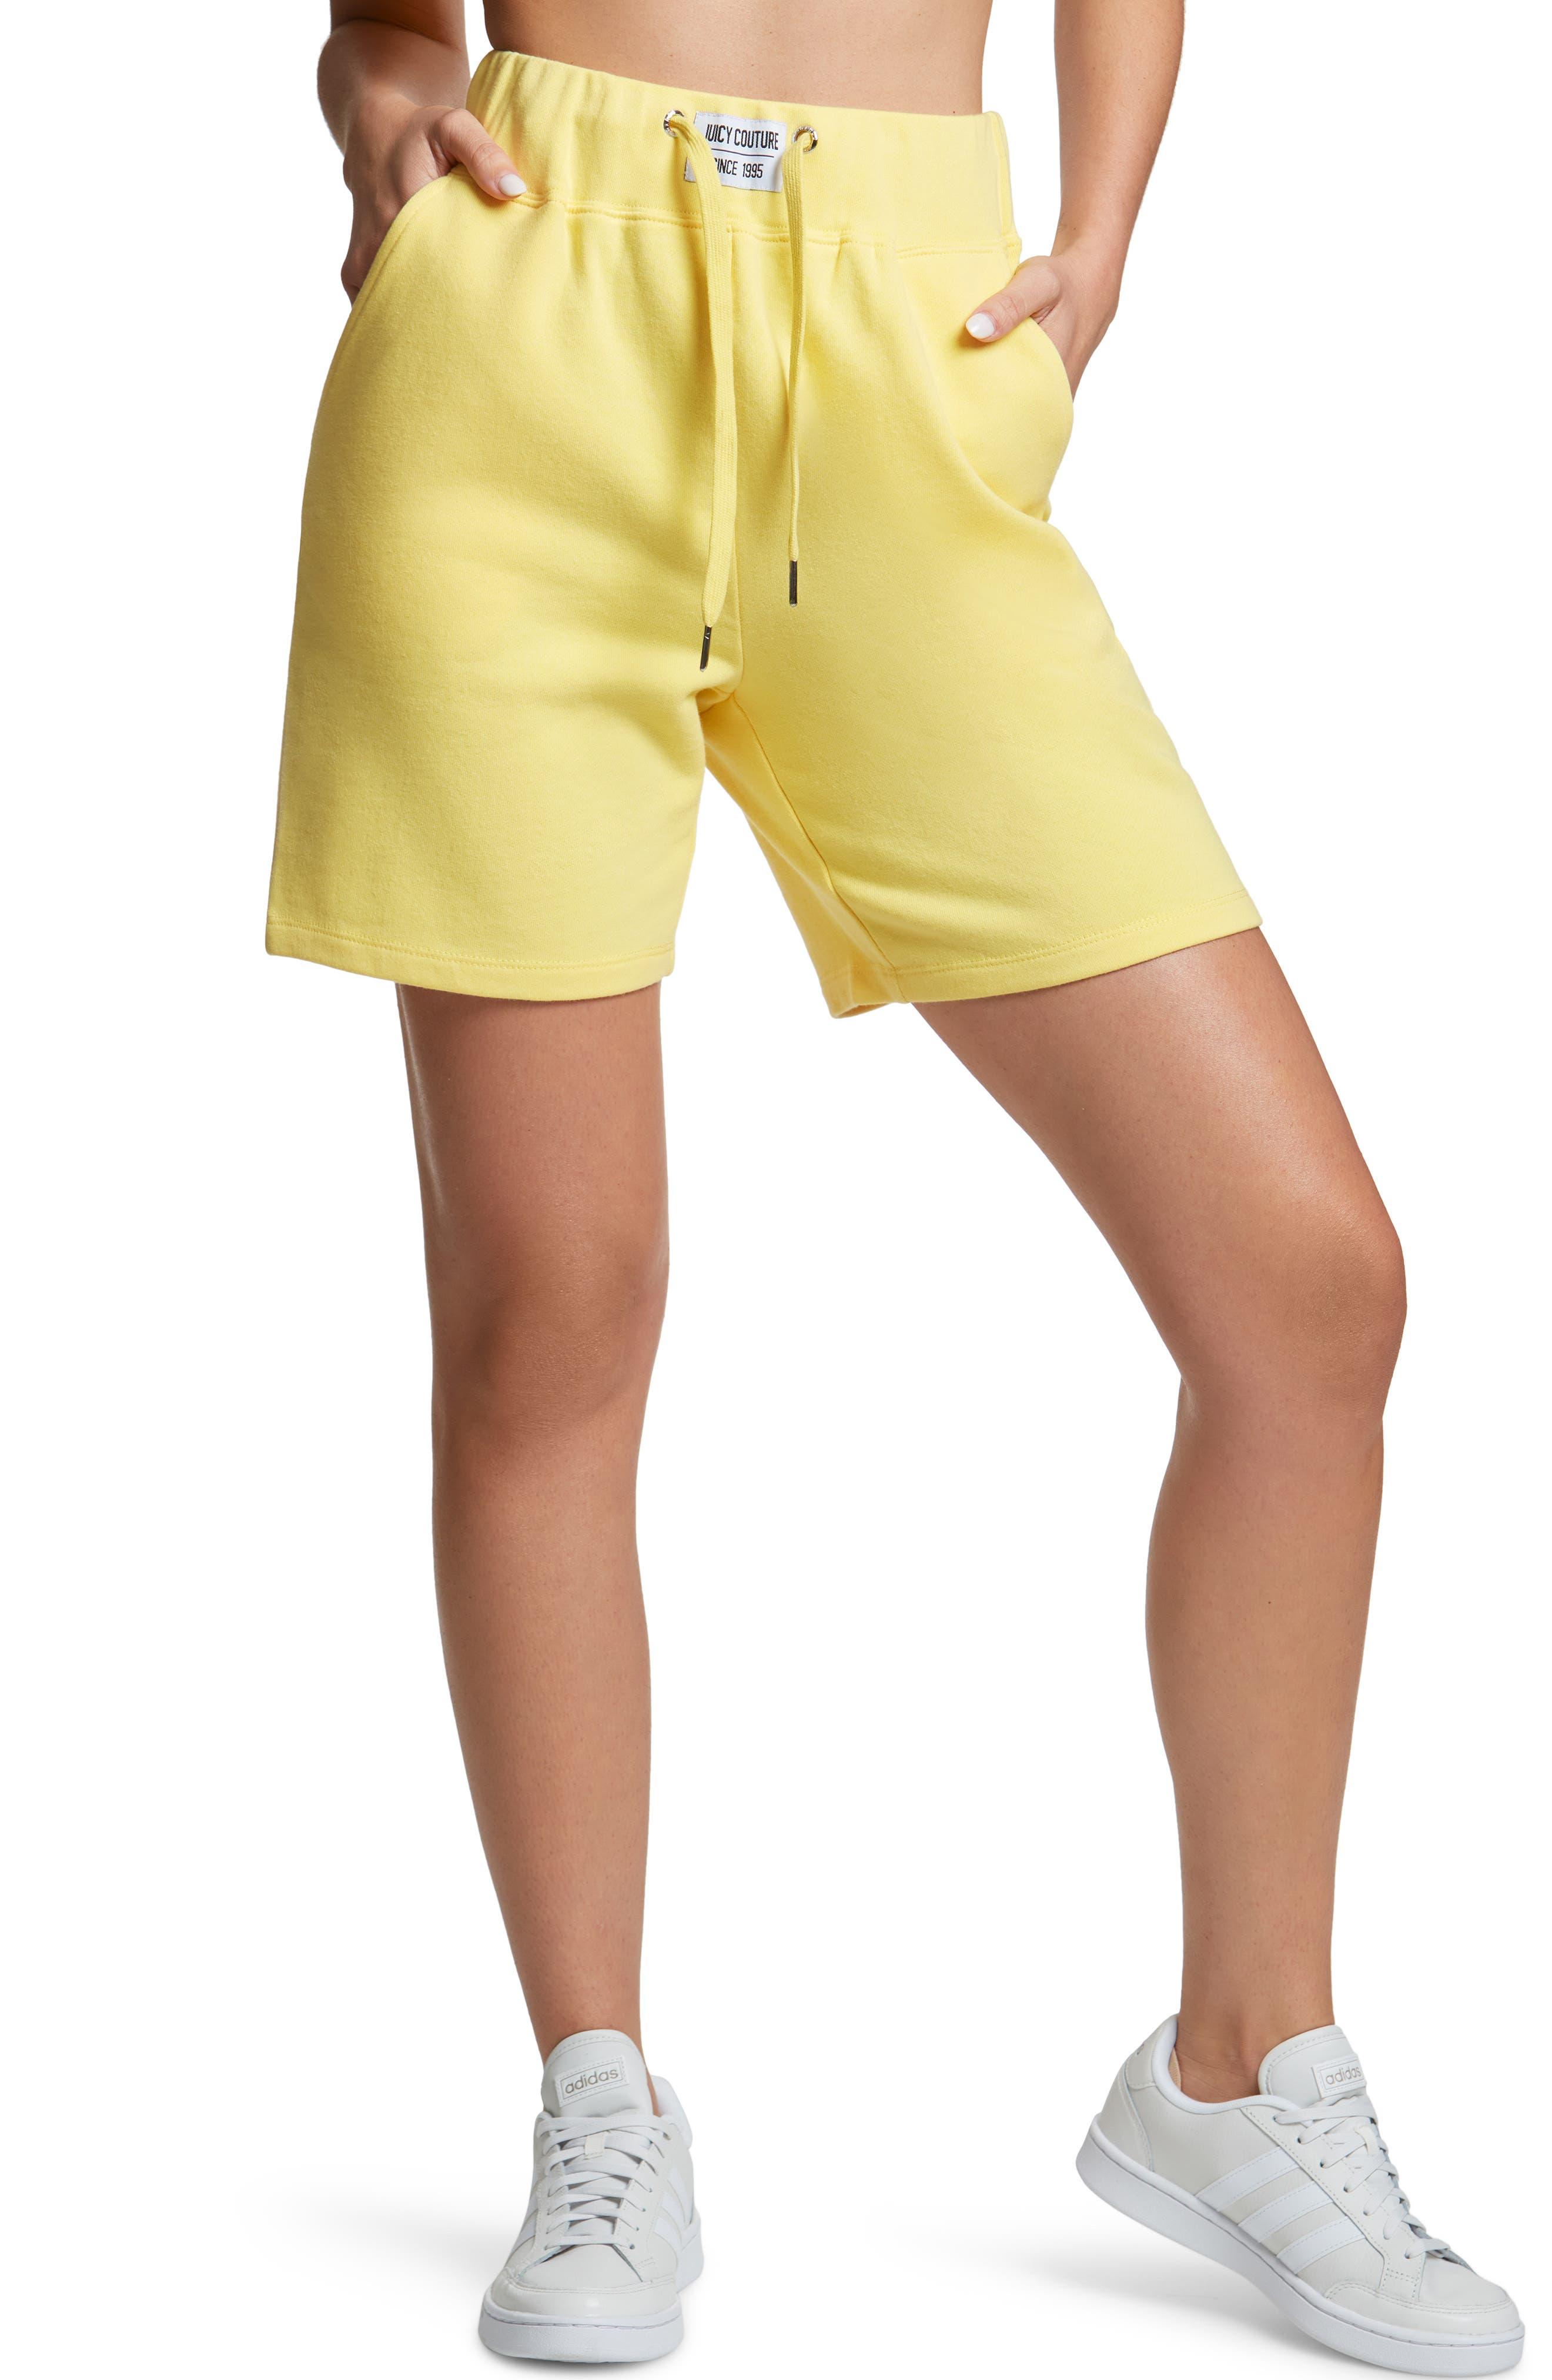 Women's High Waist French Terry Sweat Shorts